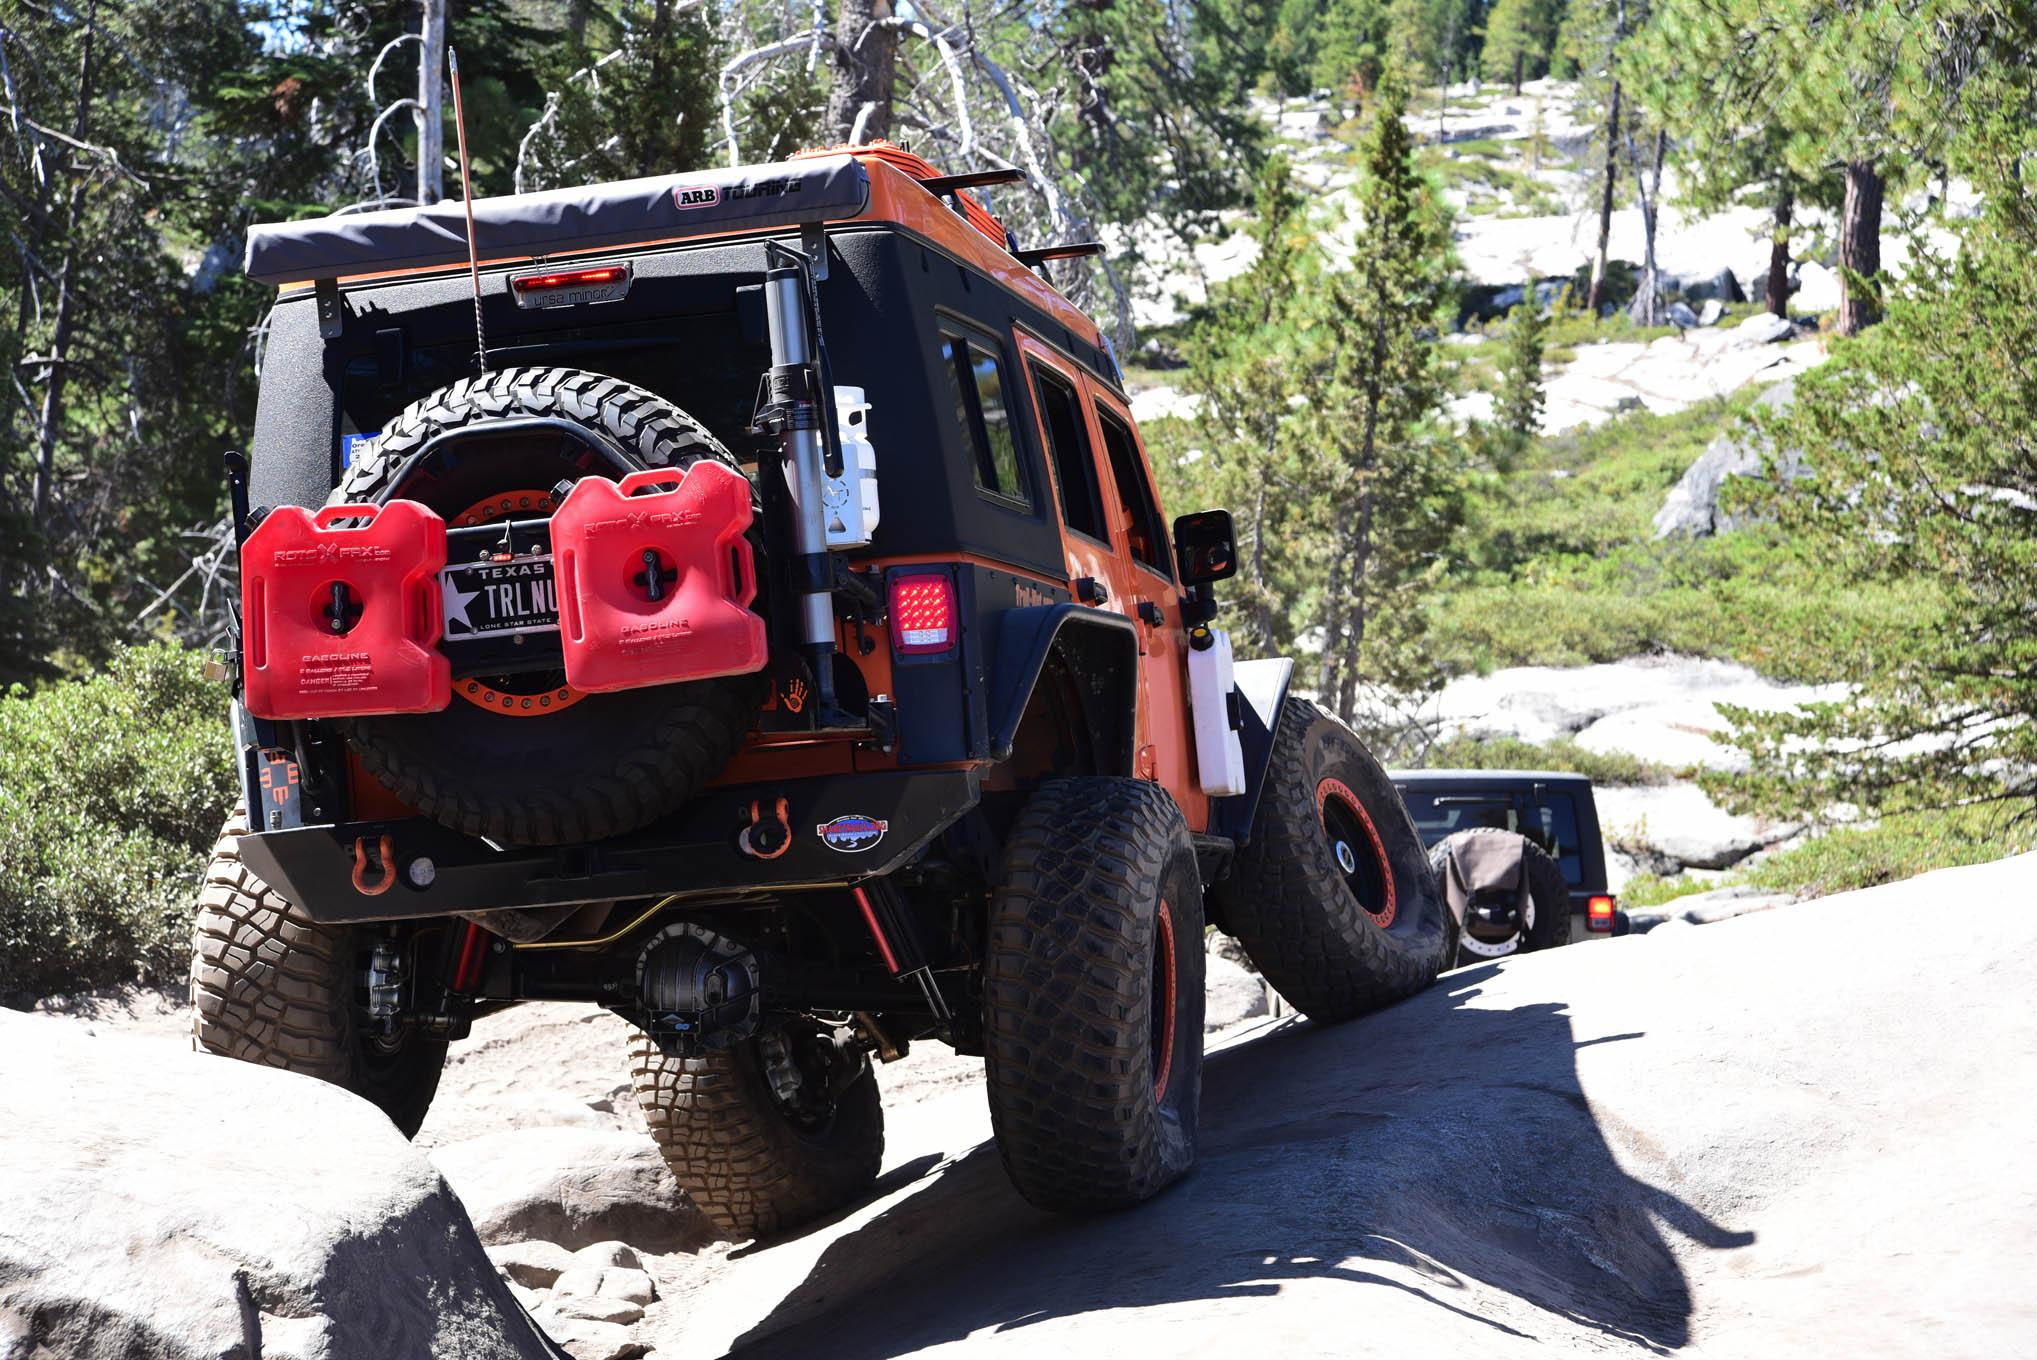 056 rubicon trail modern jeeper adventures metal cloak 2019 stuart bourdon